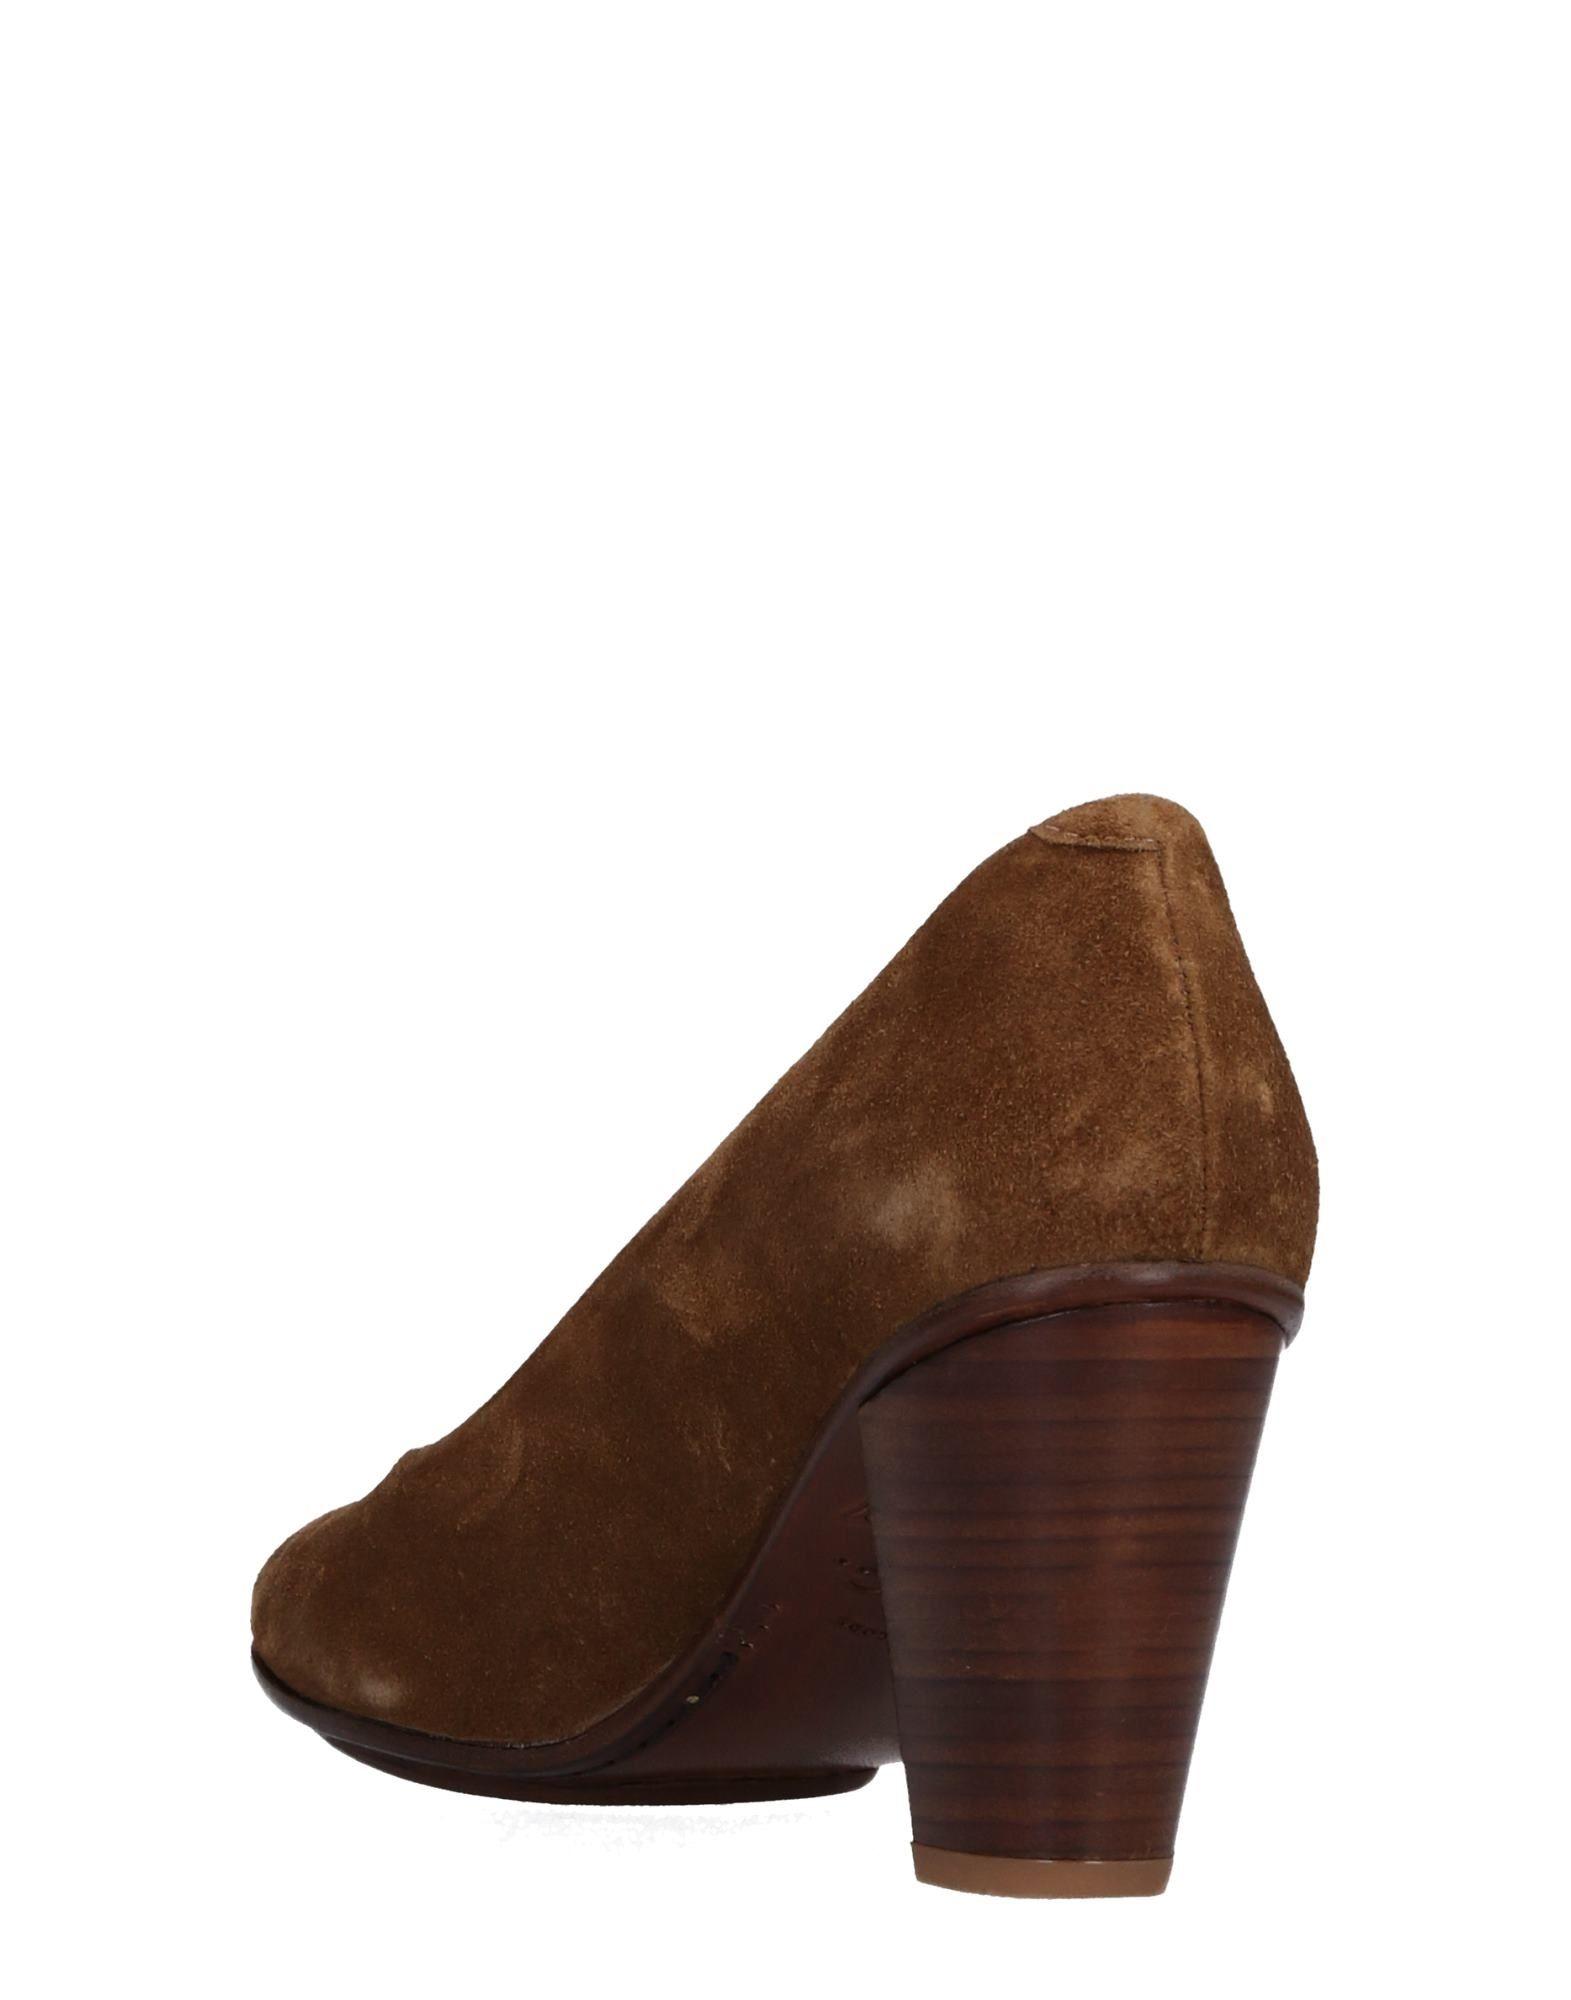 N.D.C. Made By Hand Pumps Damen  11515841DV Heiße Schuhe